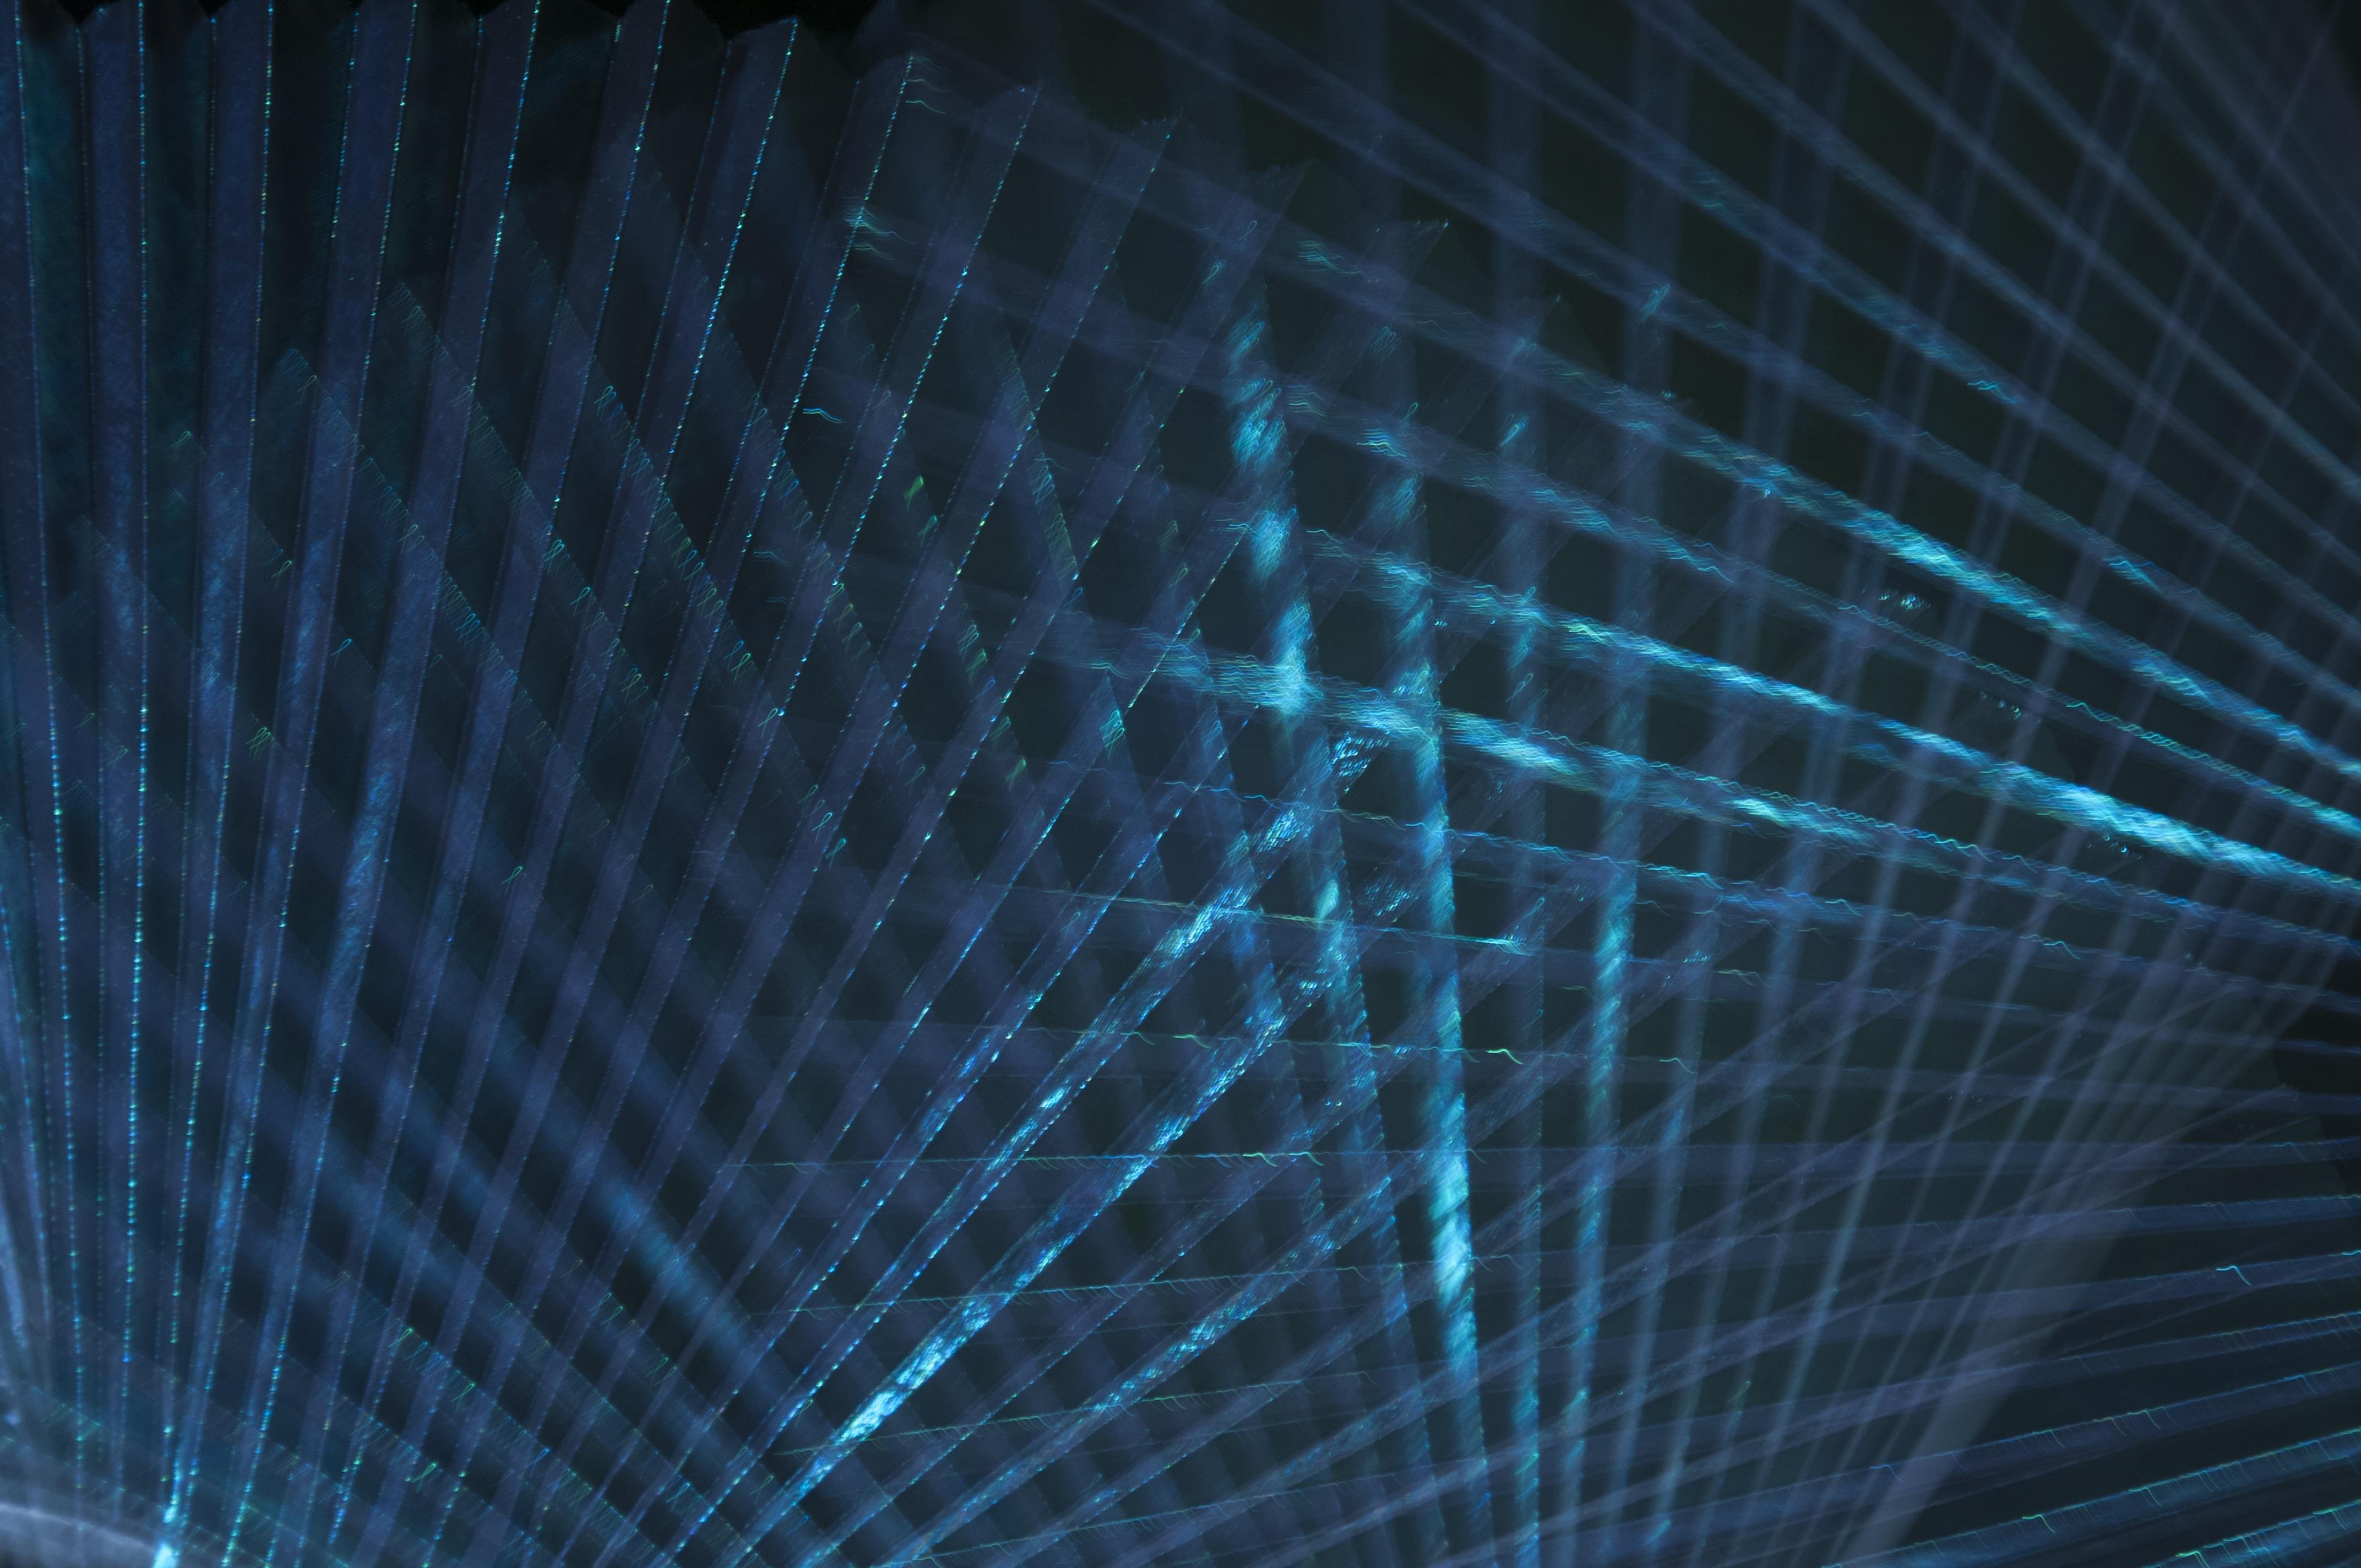 Unduh 100 Wallpaper Biru Teknologi HD Gratis